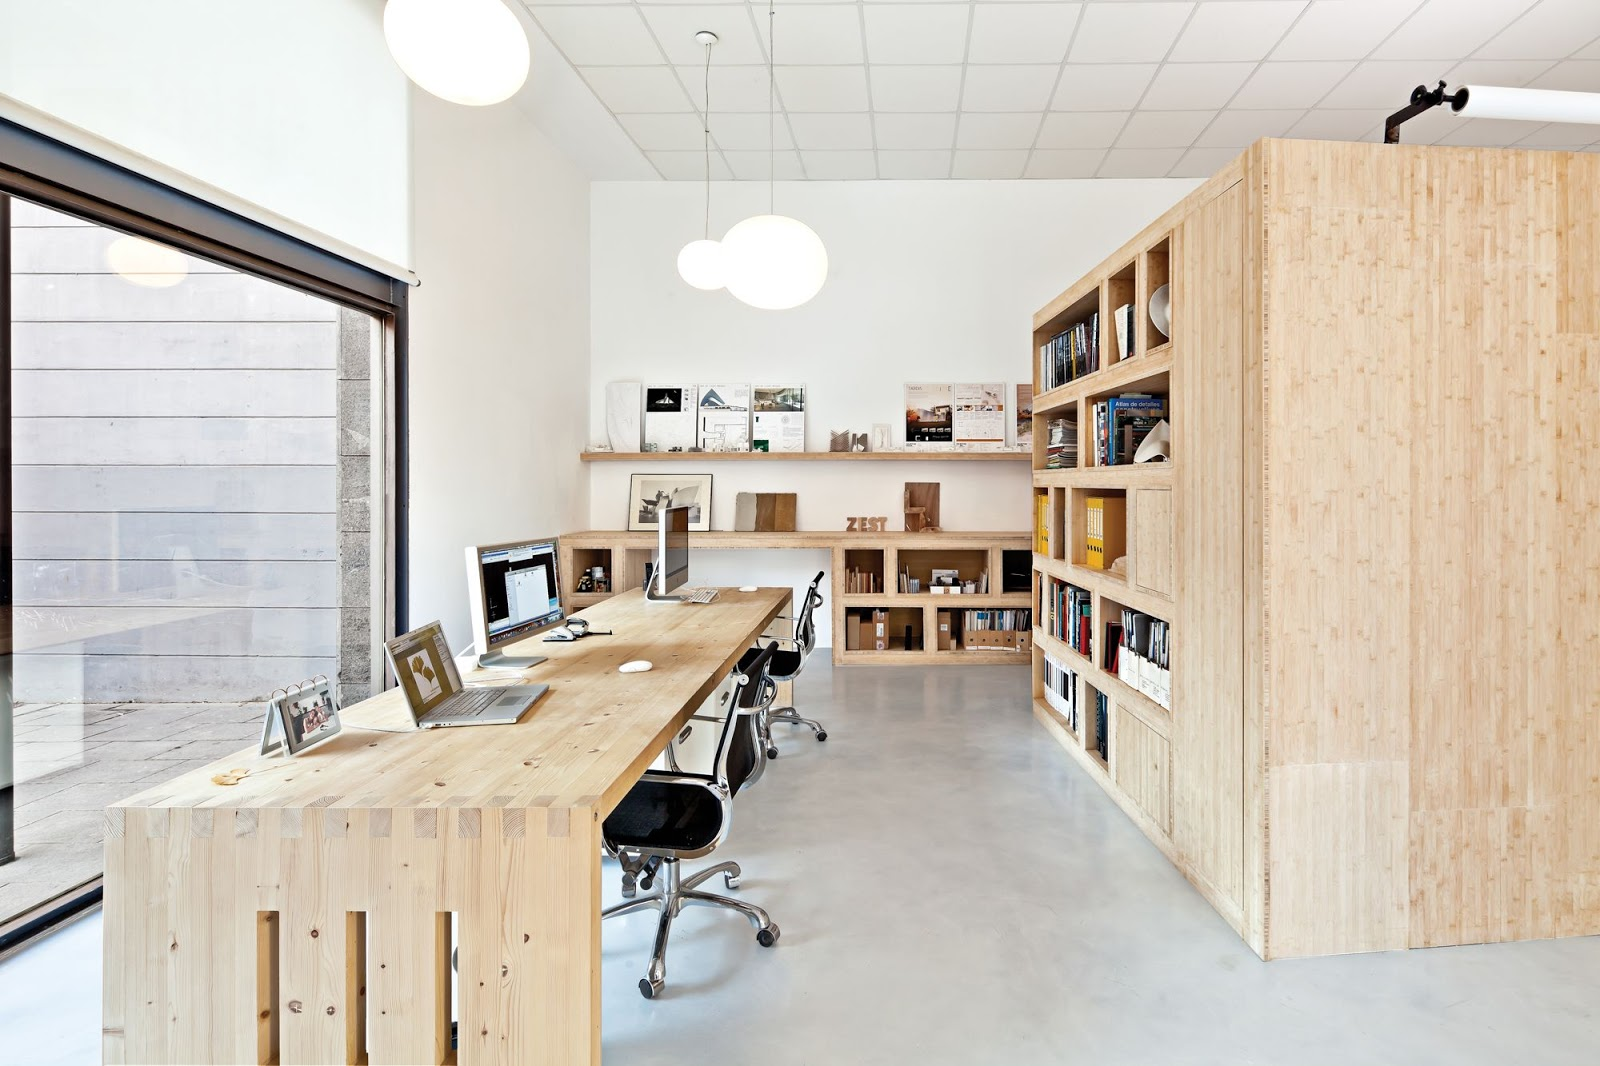 Zest architecture a f a s i a for Oficinas de trabajo temporal en barcelona